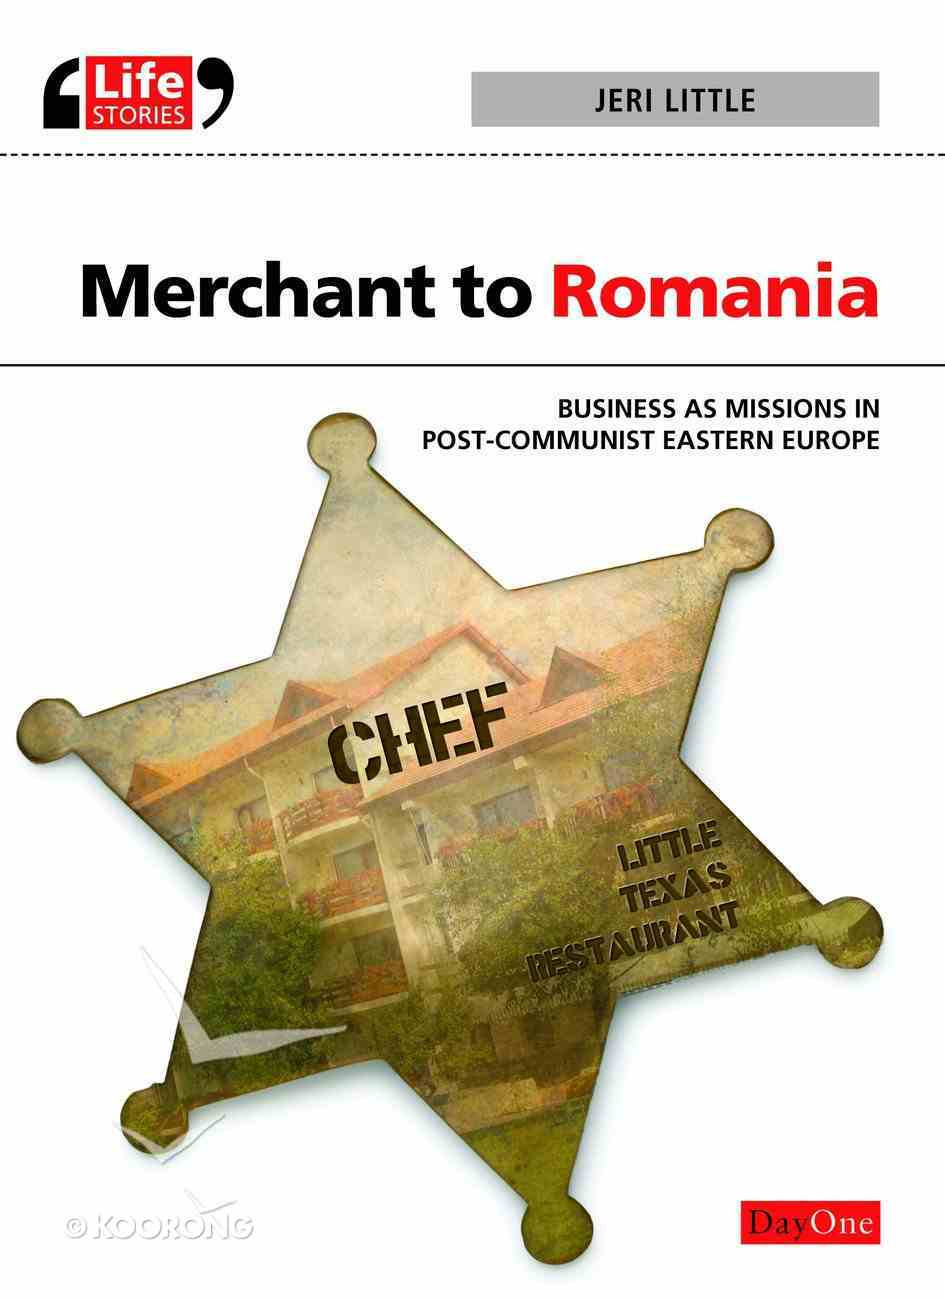 Merchant to Romania (Life Stories Series) eBook